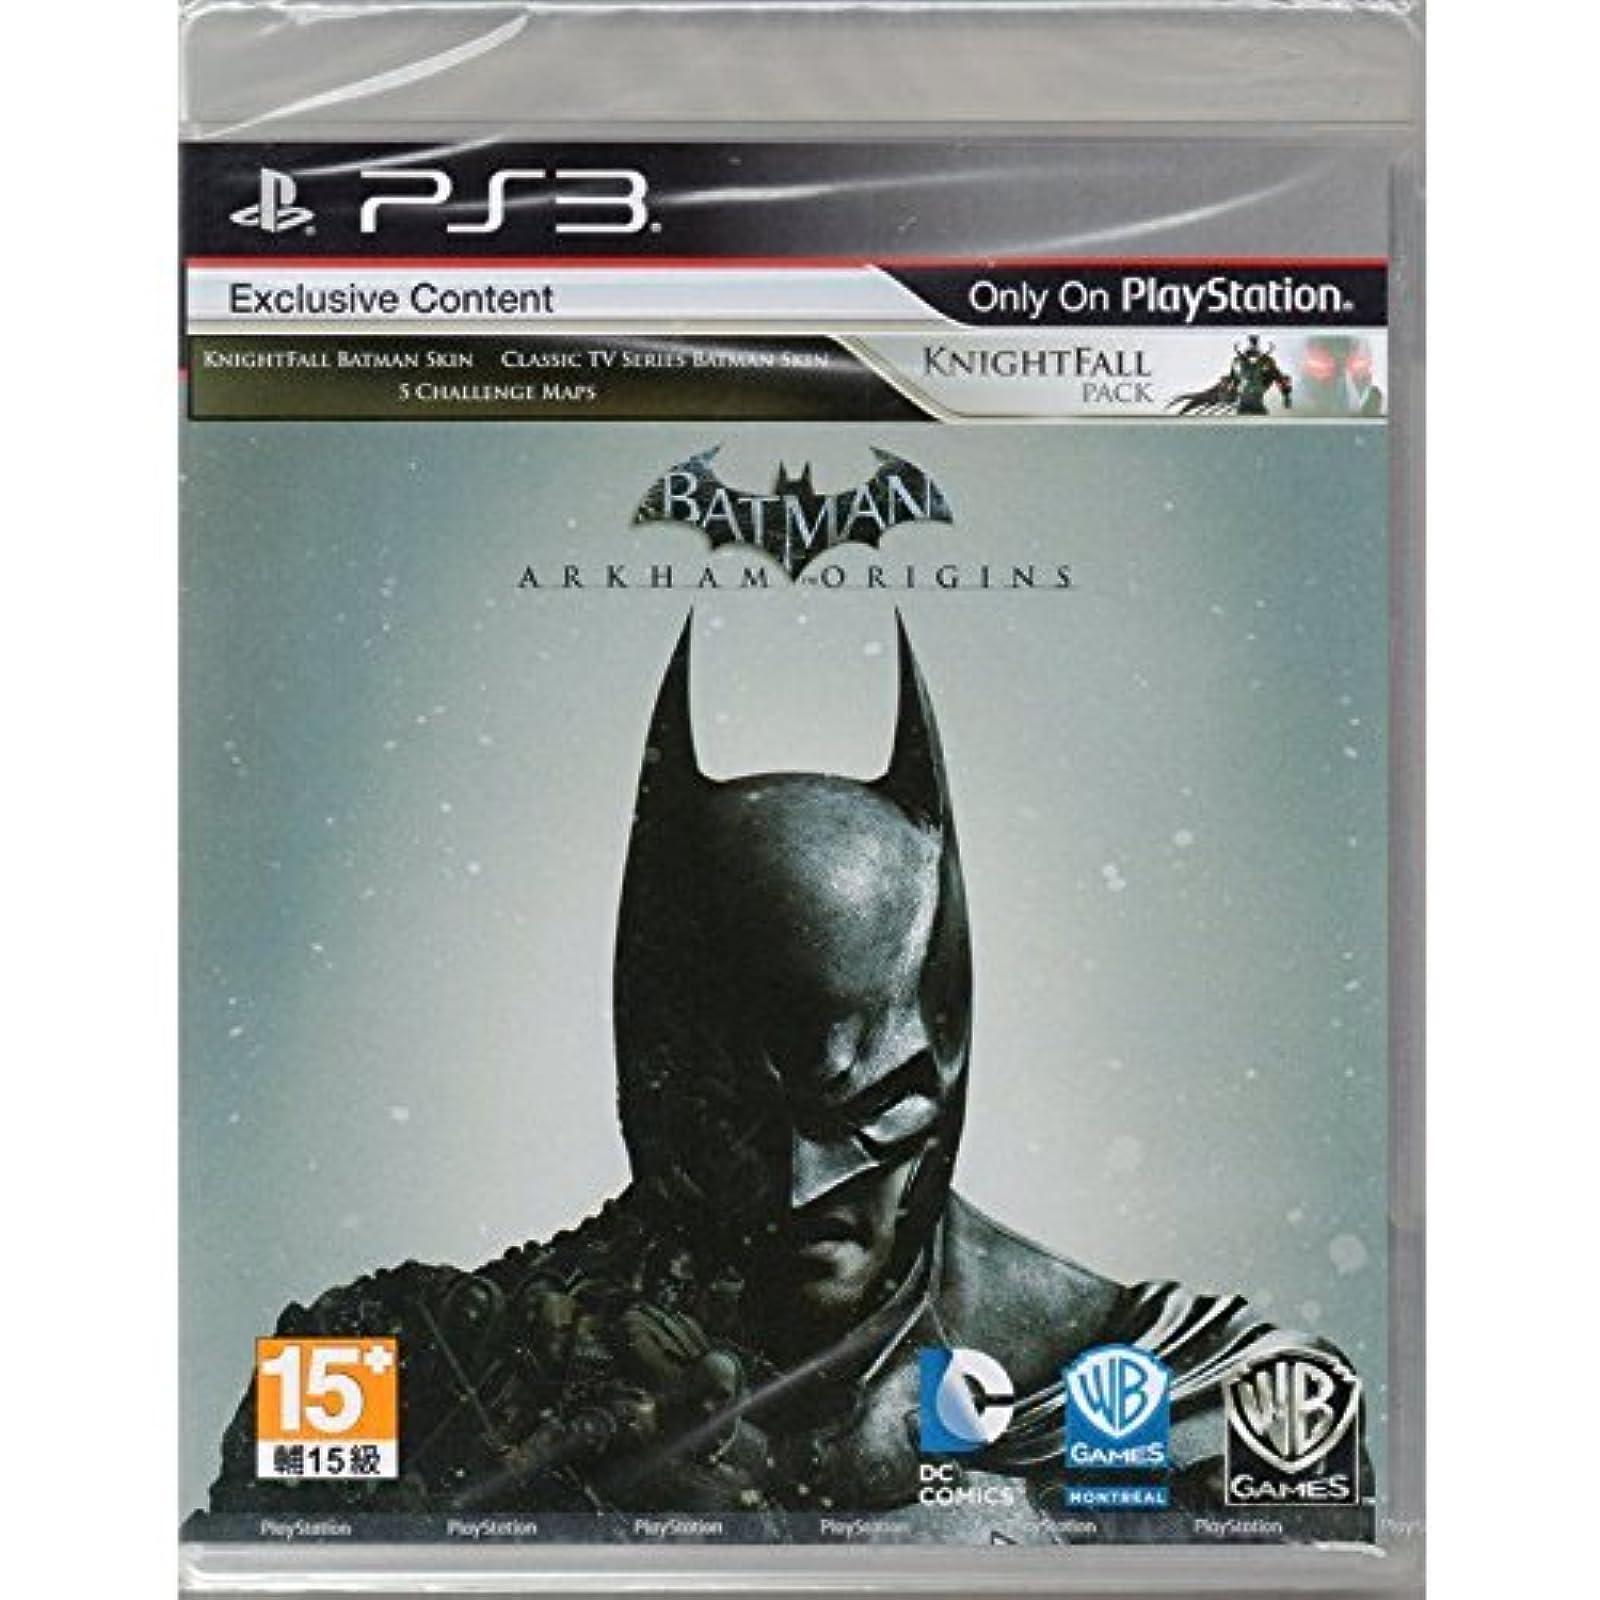 Batman: Arkham Origins Knightfall Game For PlayStation PS3